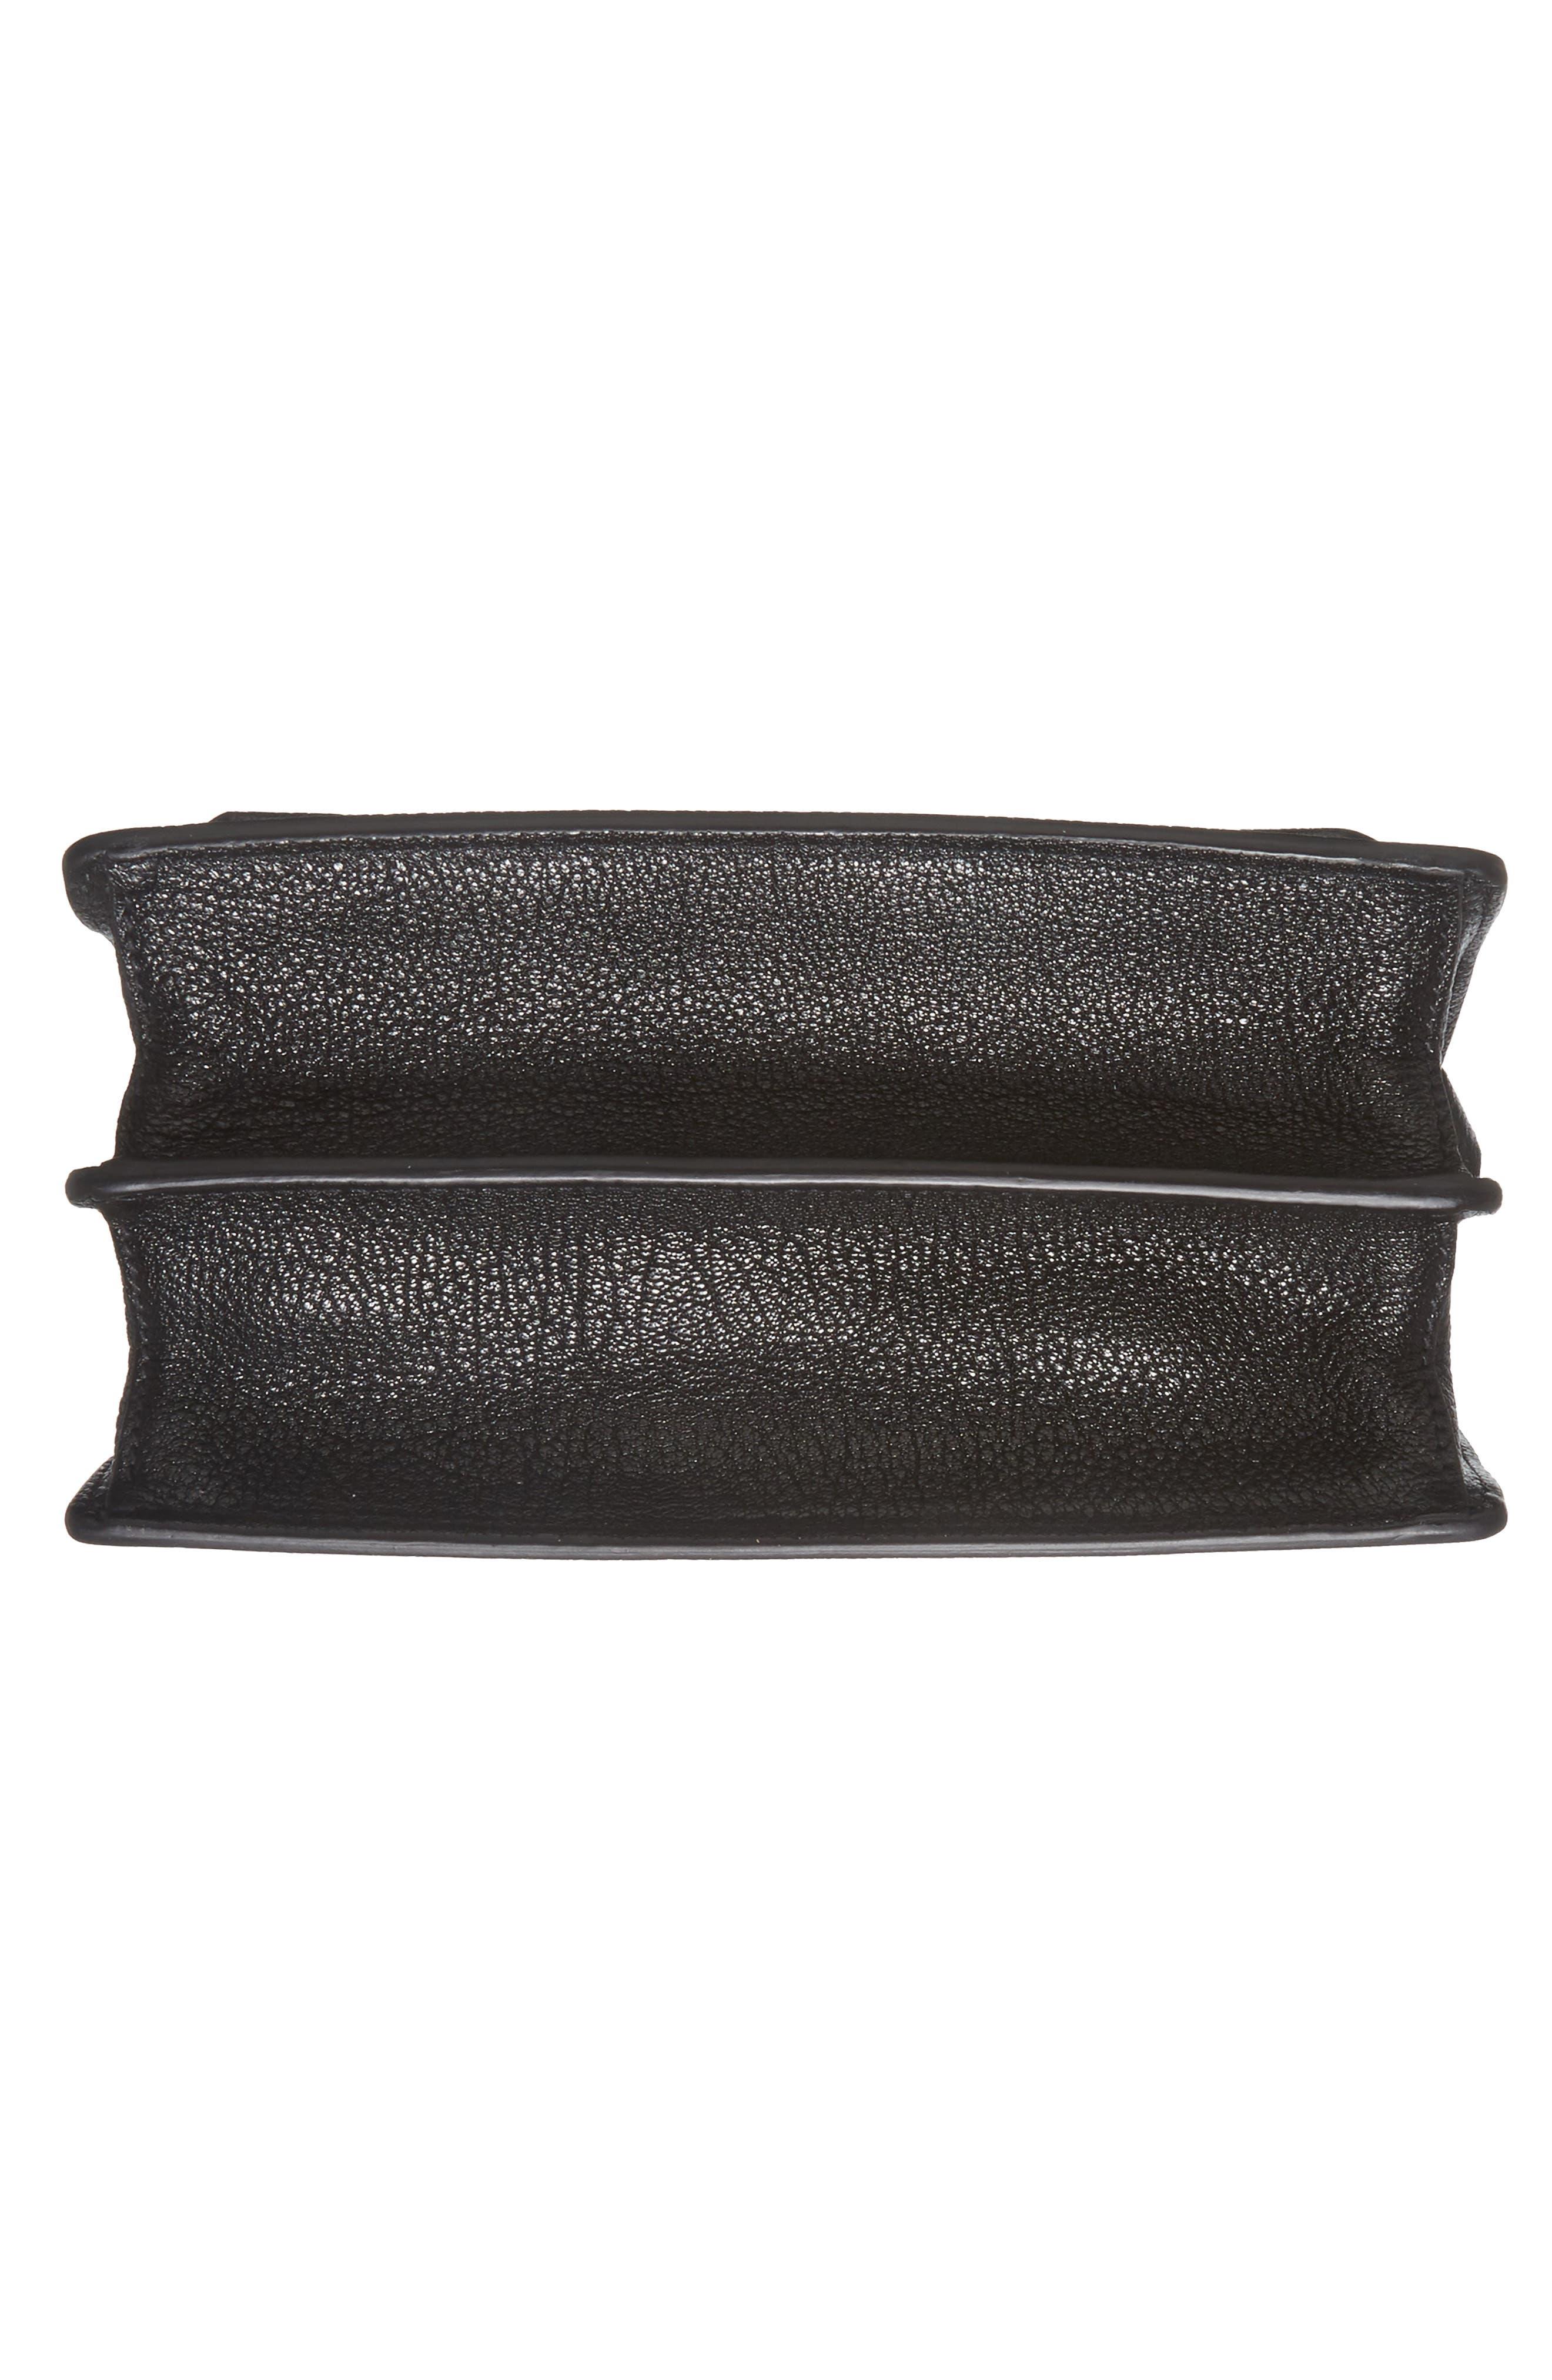 Madras Leather Crossbody Bag,                             Alternate thumbnail 6, color,                             001